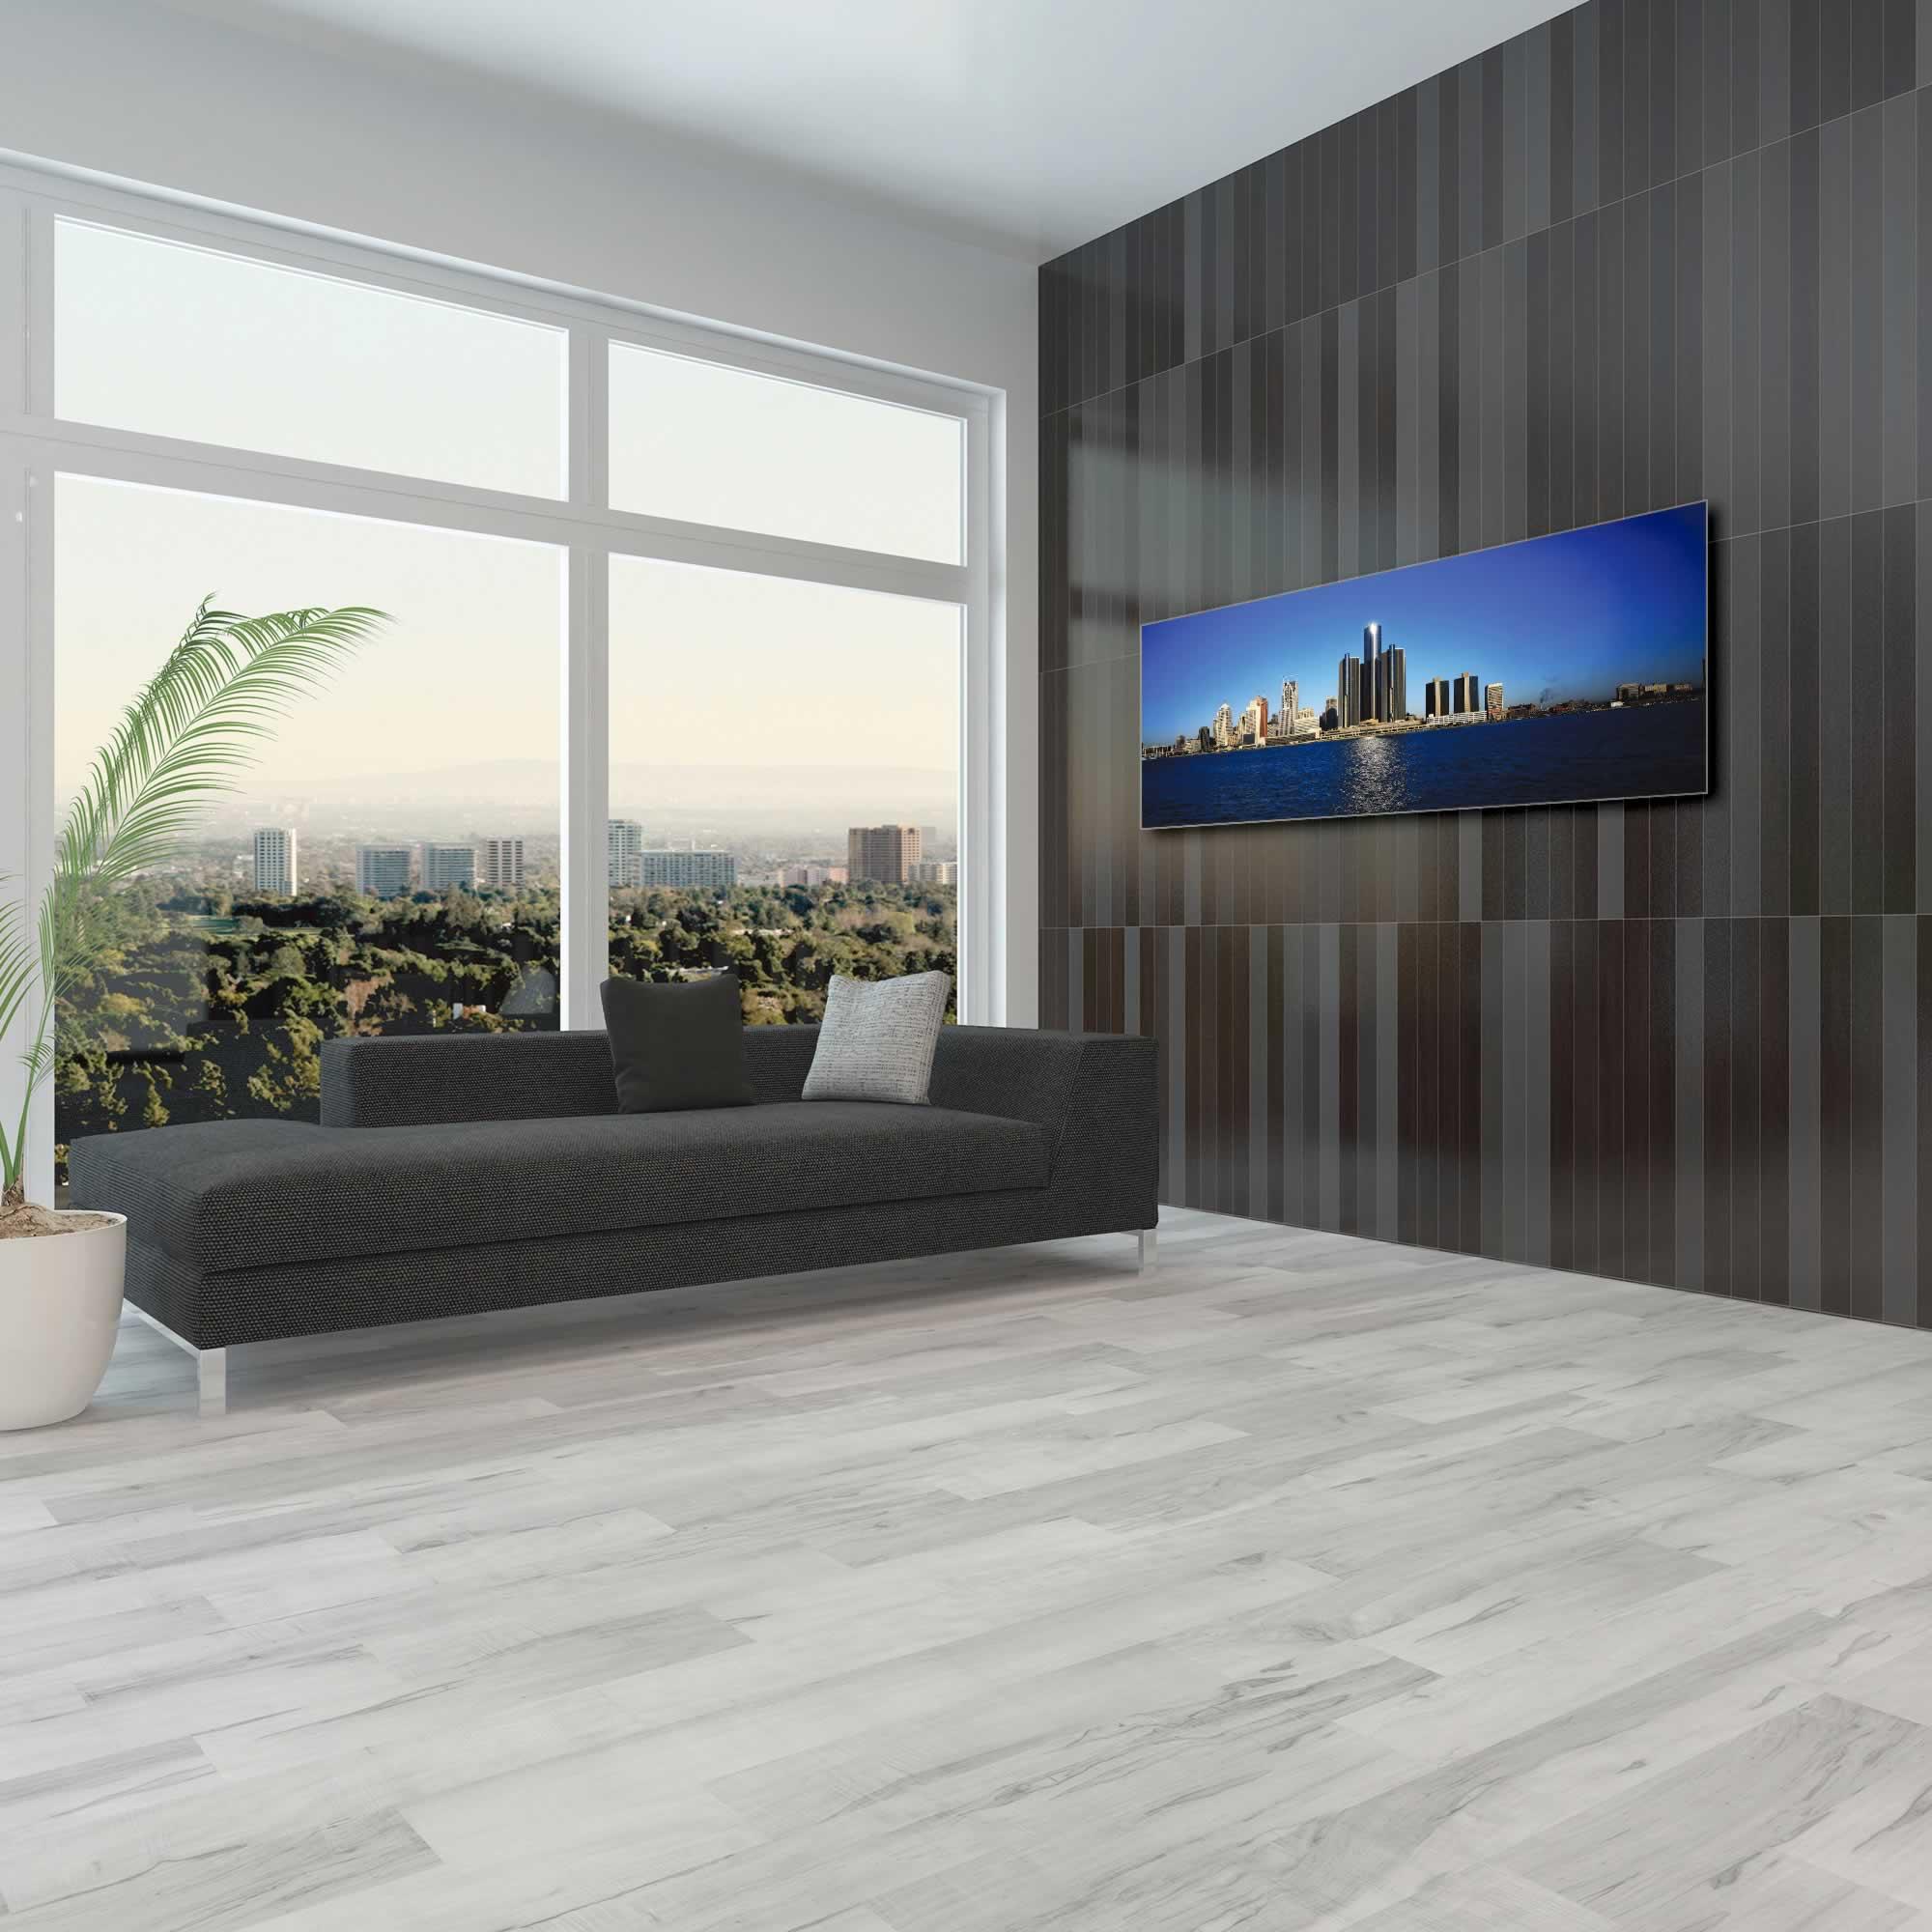 Detroit City Skyline - Urban Modern Art, Designer Home Decor, Cityscape Wall Artwork, Trendy Contemporary Art - Alternate View 1